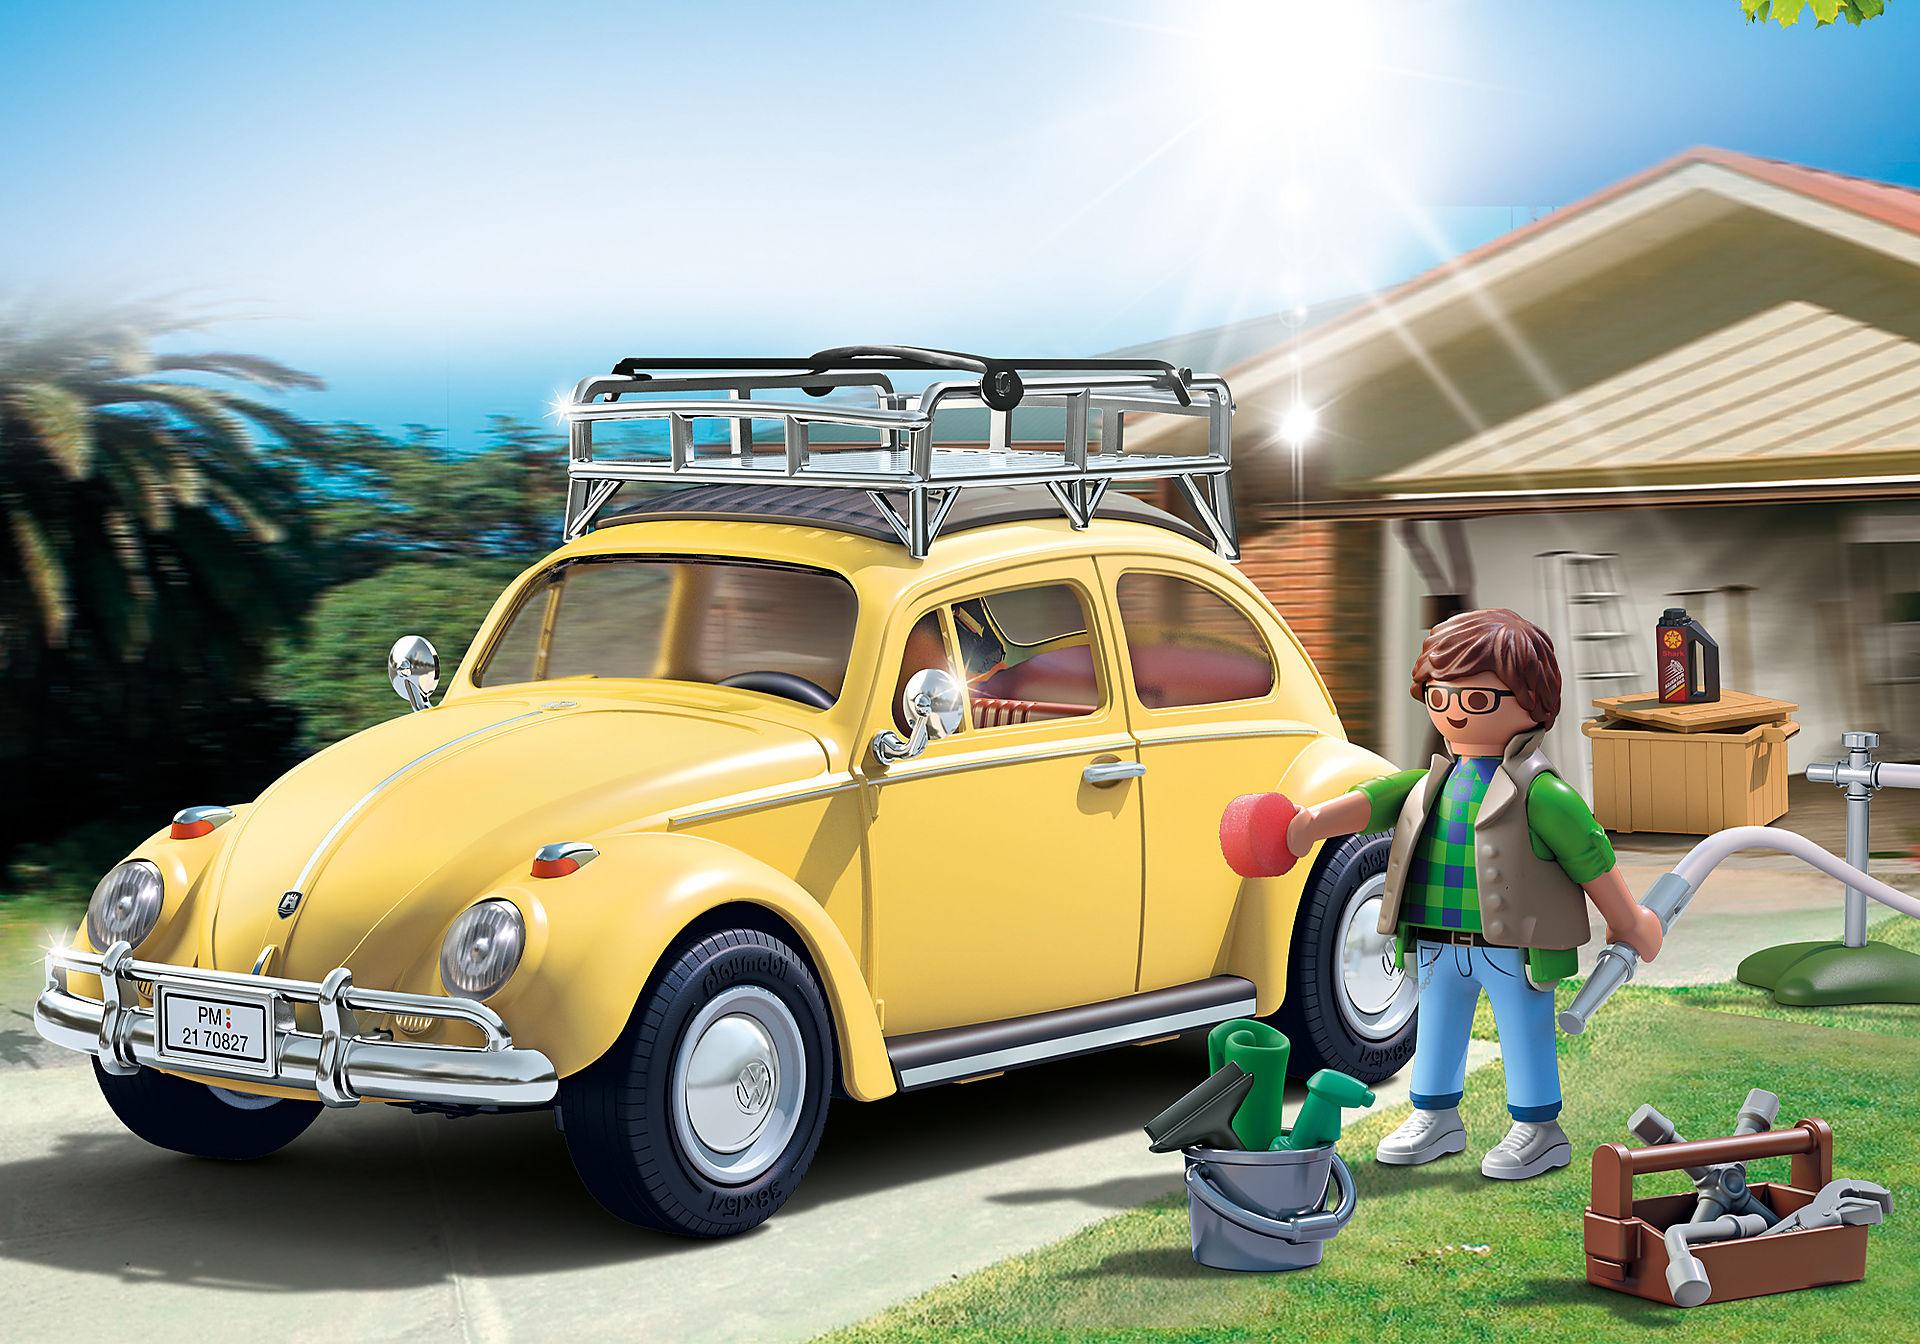 70827 Volkswagen Σκαραβαίος - Special Edition zoom image8